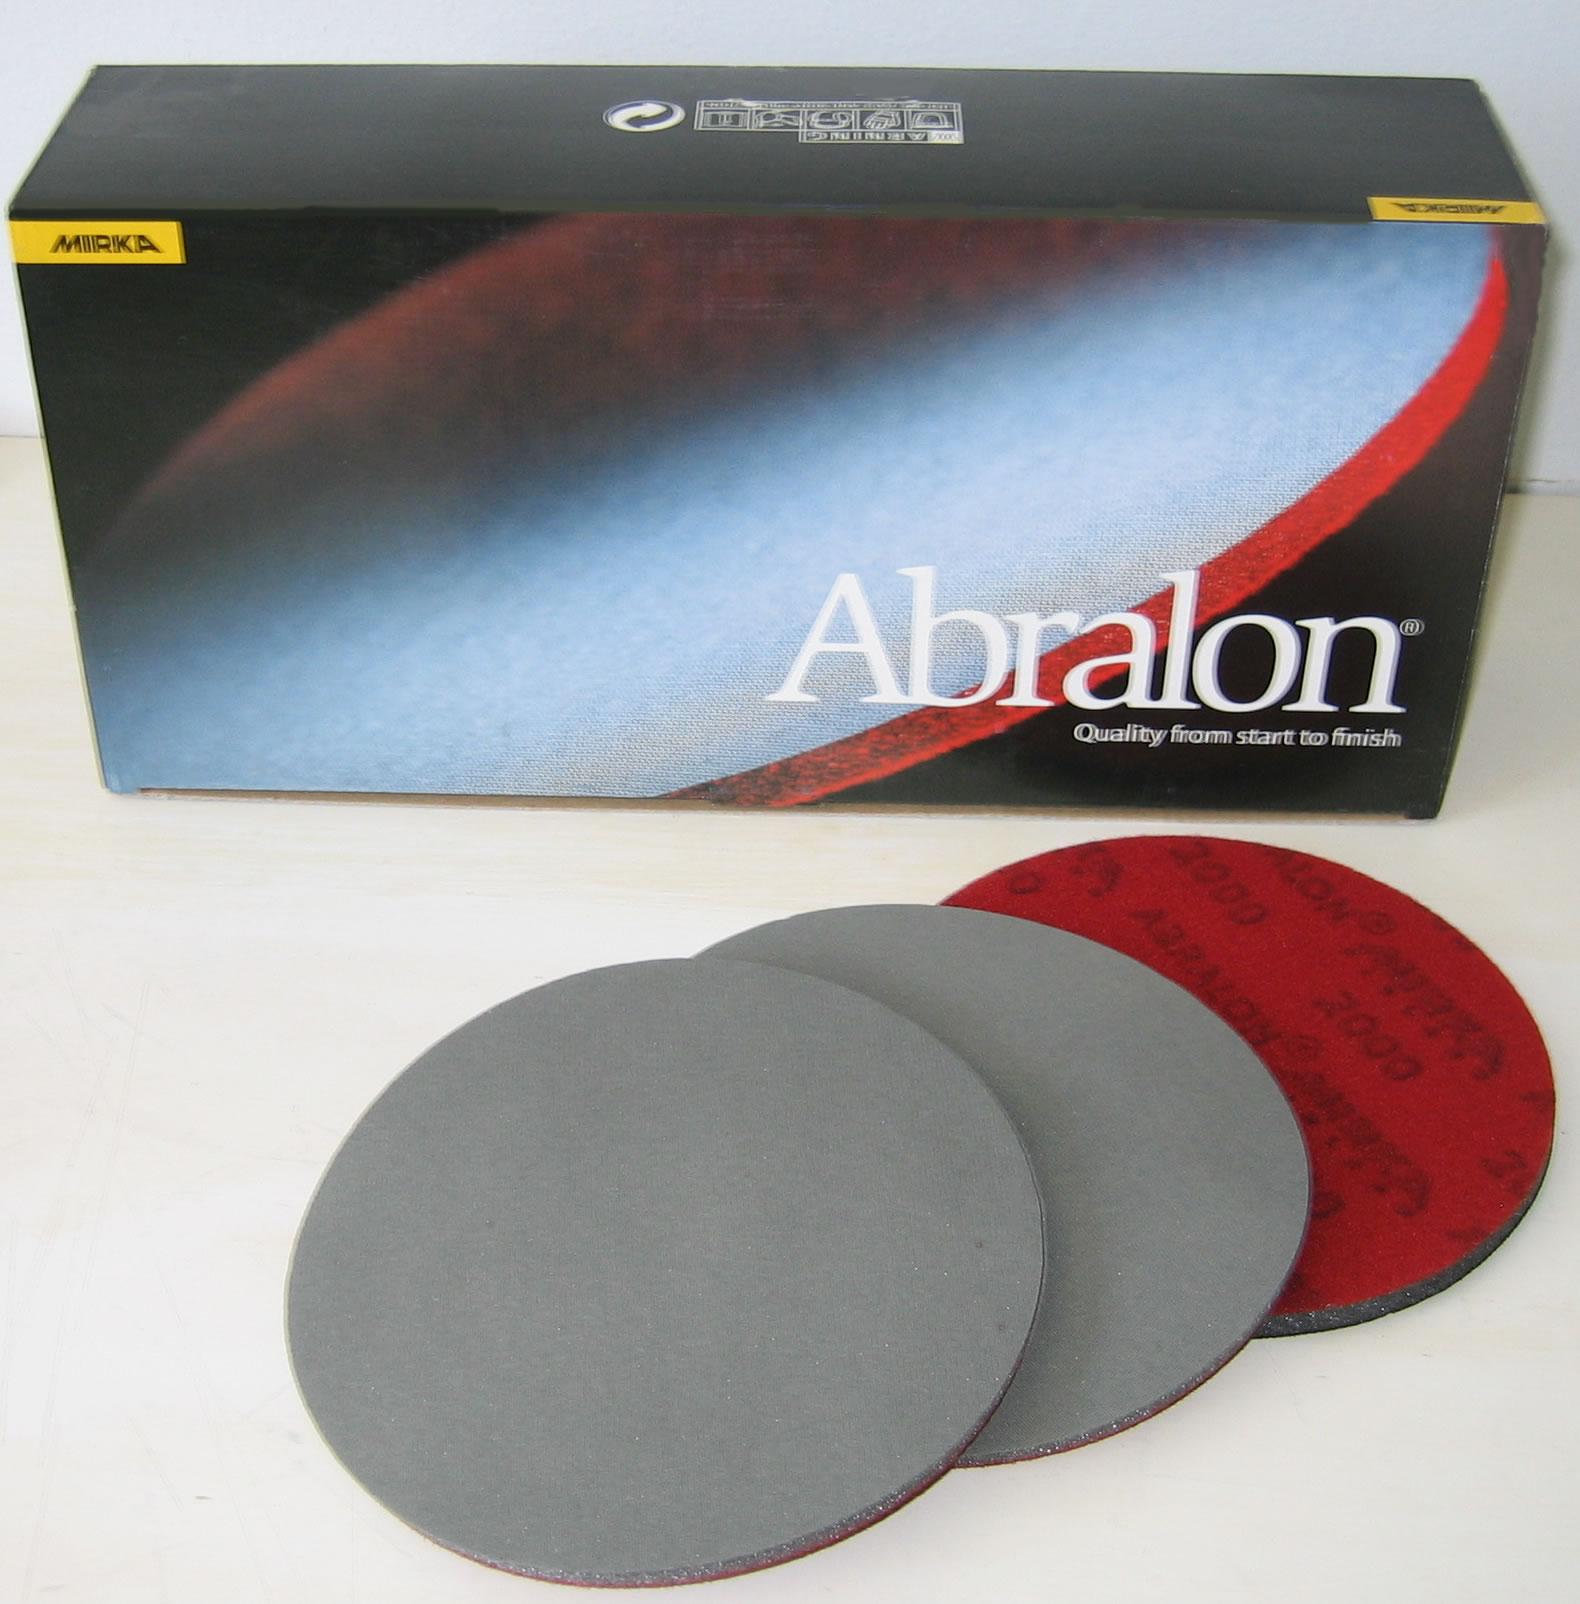 Abralon 3 Inch 4000 Grit 20 Discs by Mirka Abrasives